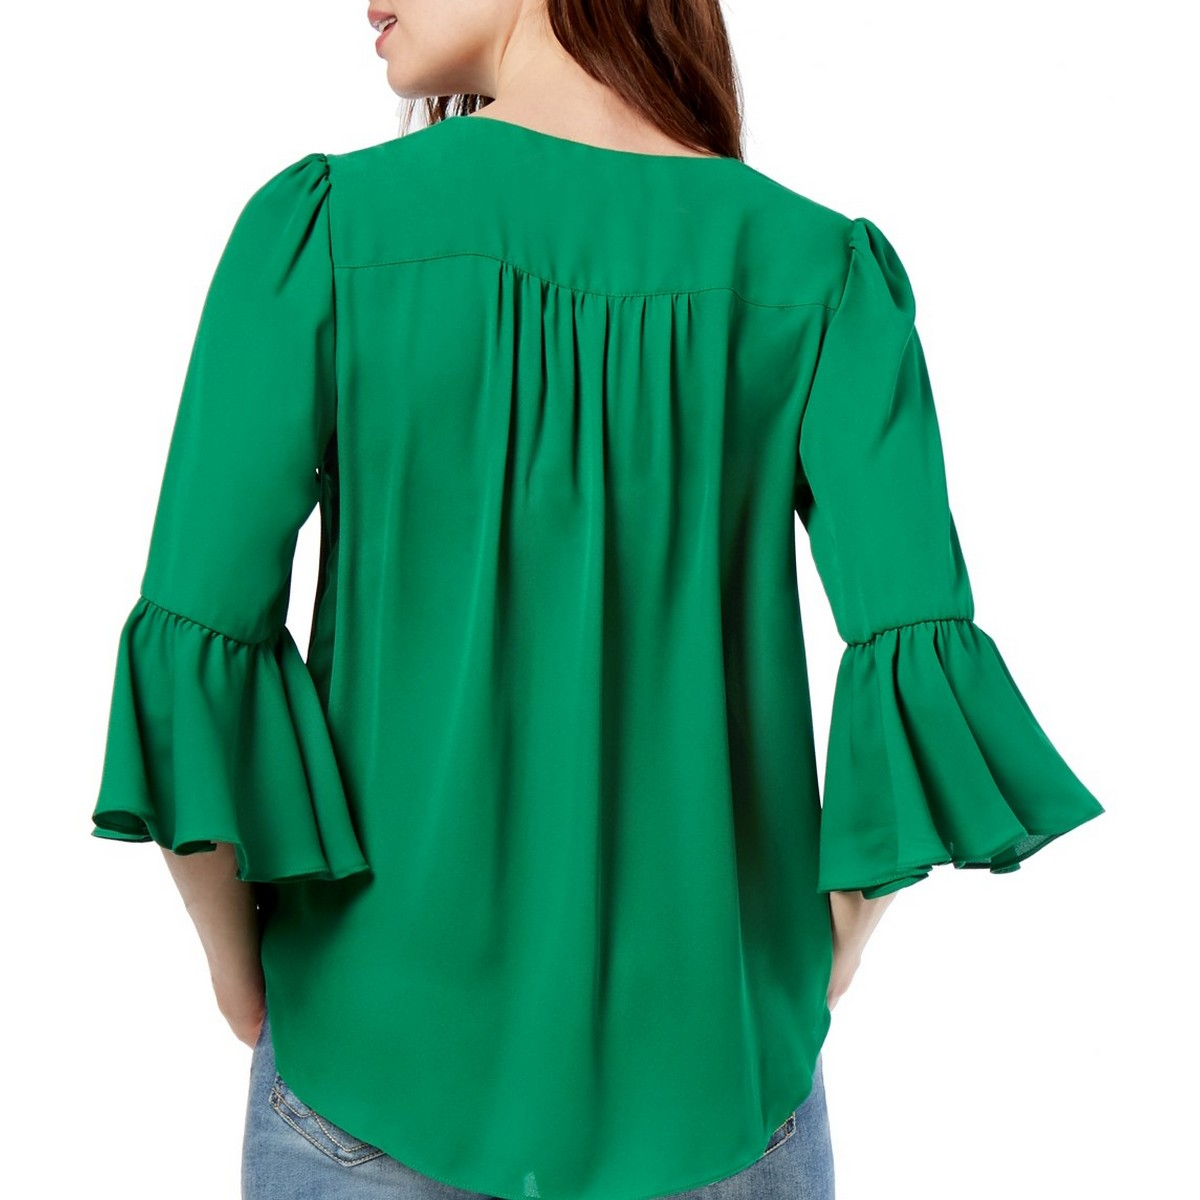 INC-NEW-Women-039-s-Surplice-Bell-Sleeve-High-Low-Blouse-Shirt-Top-TEDO thumbnail 6